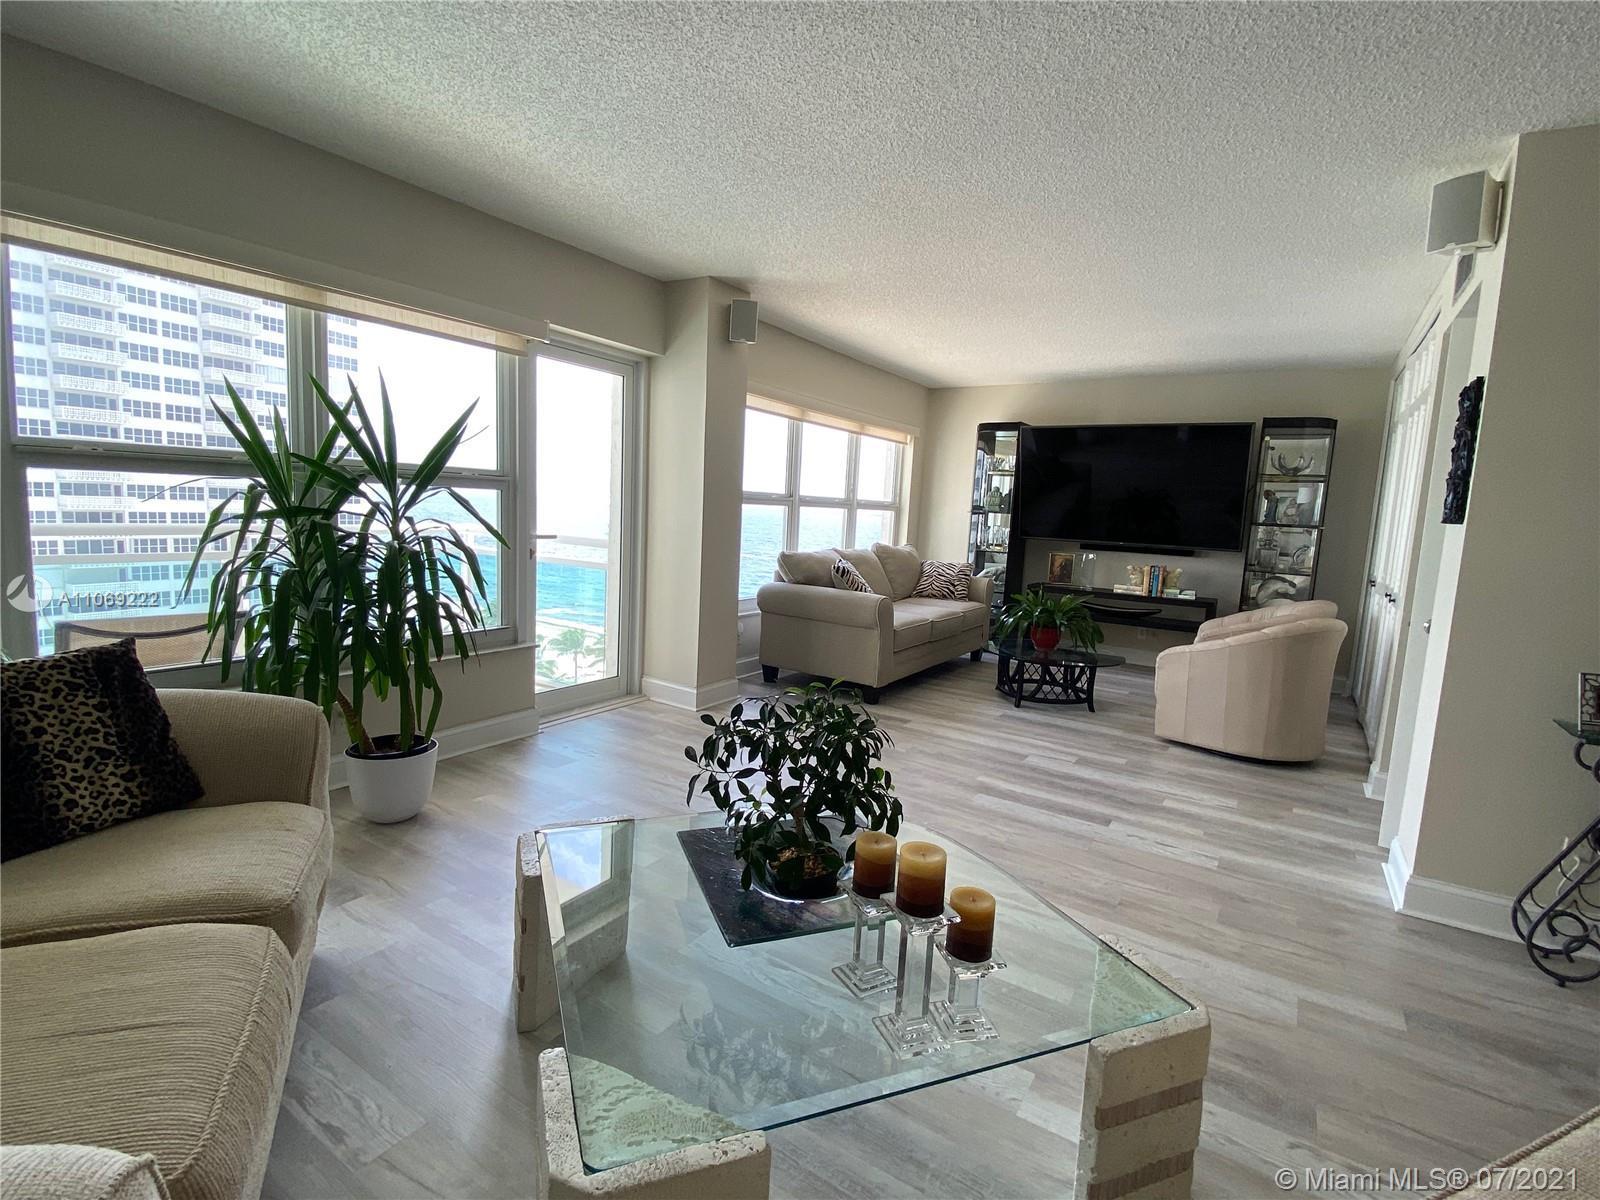 Playa Del Mar, Luxury Resort Condo Living at its Finest. Stunning Ocean views 2 bed 2 Bath Northern